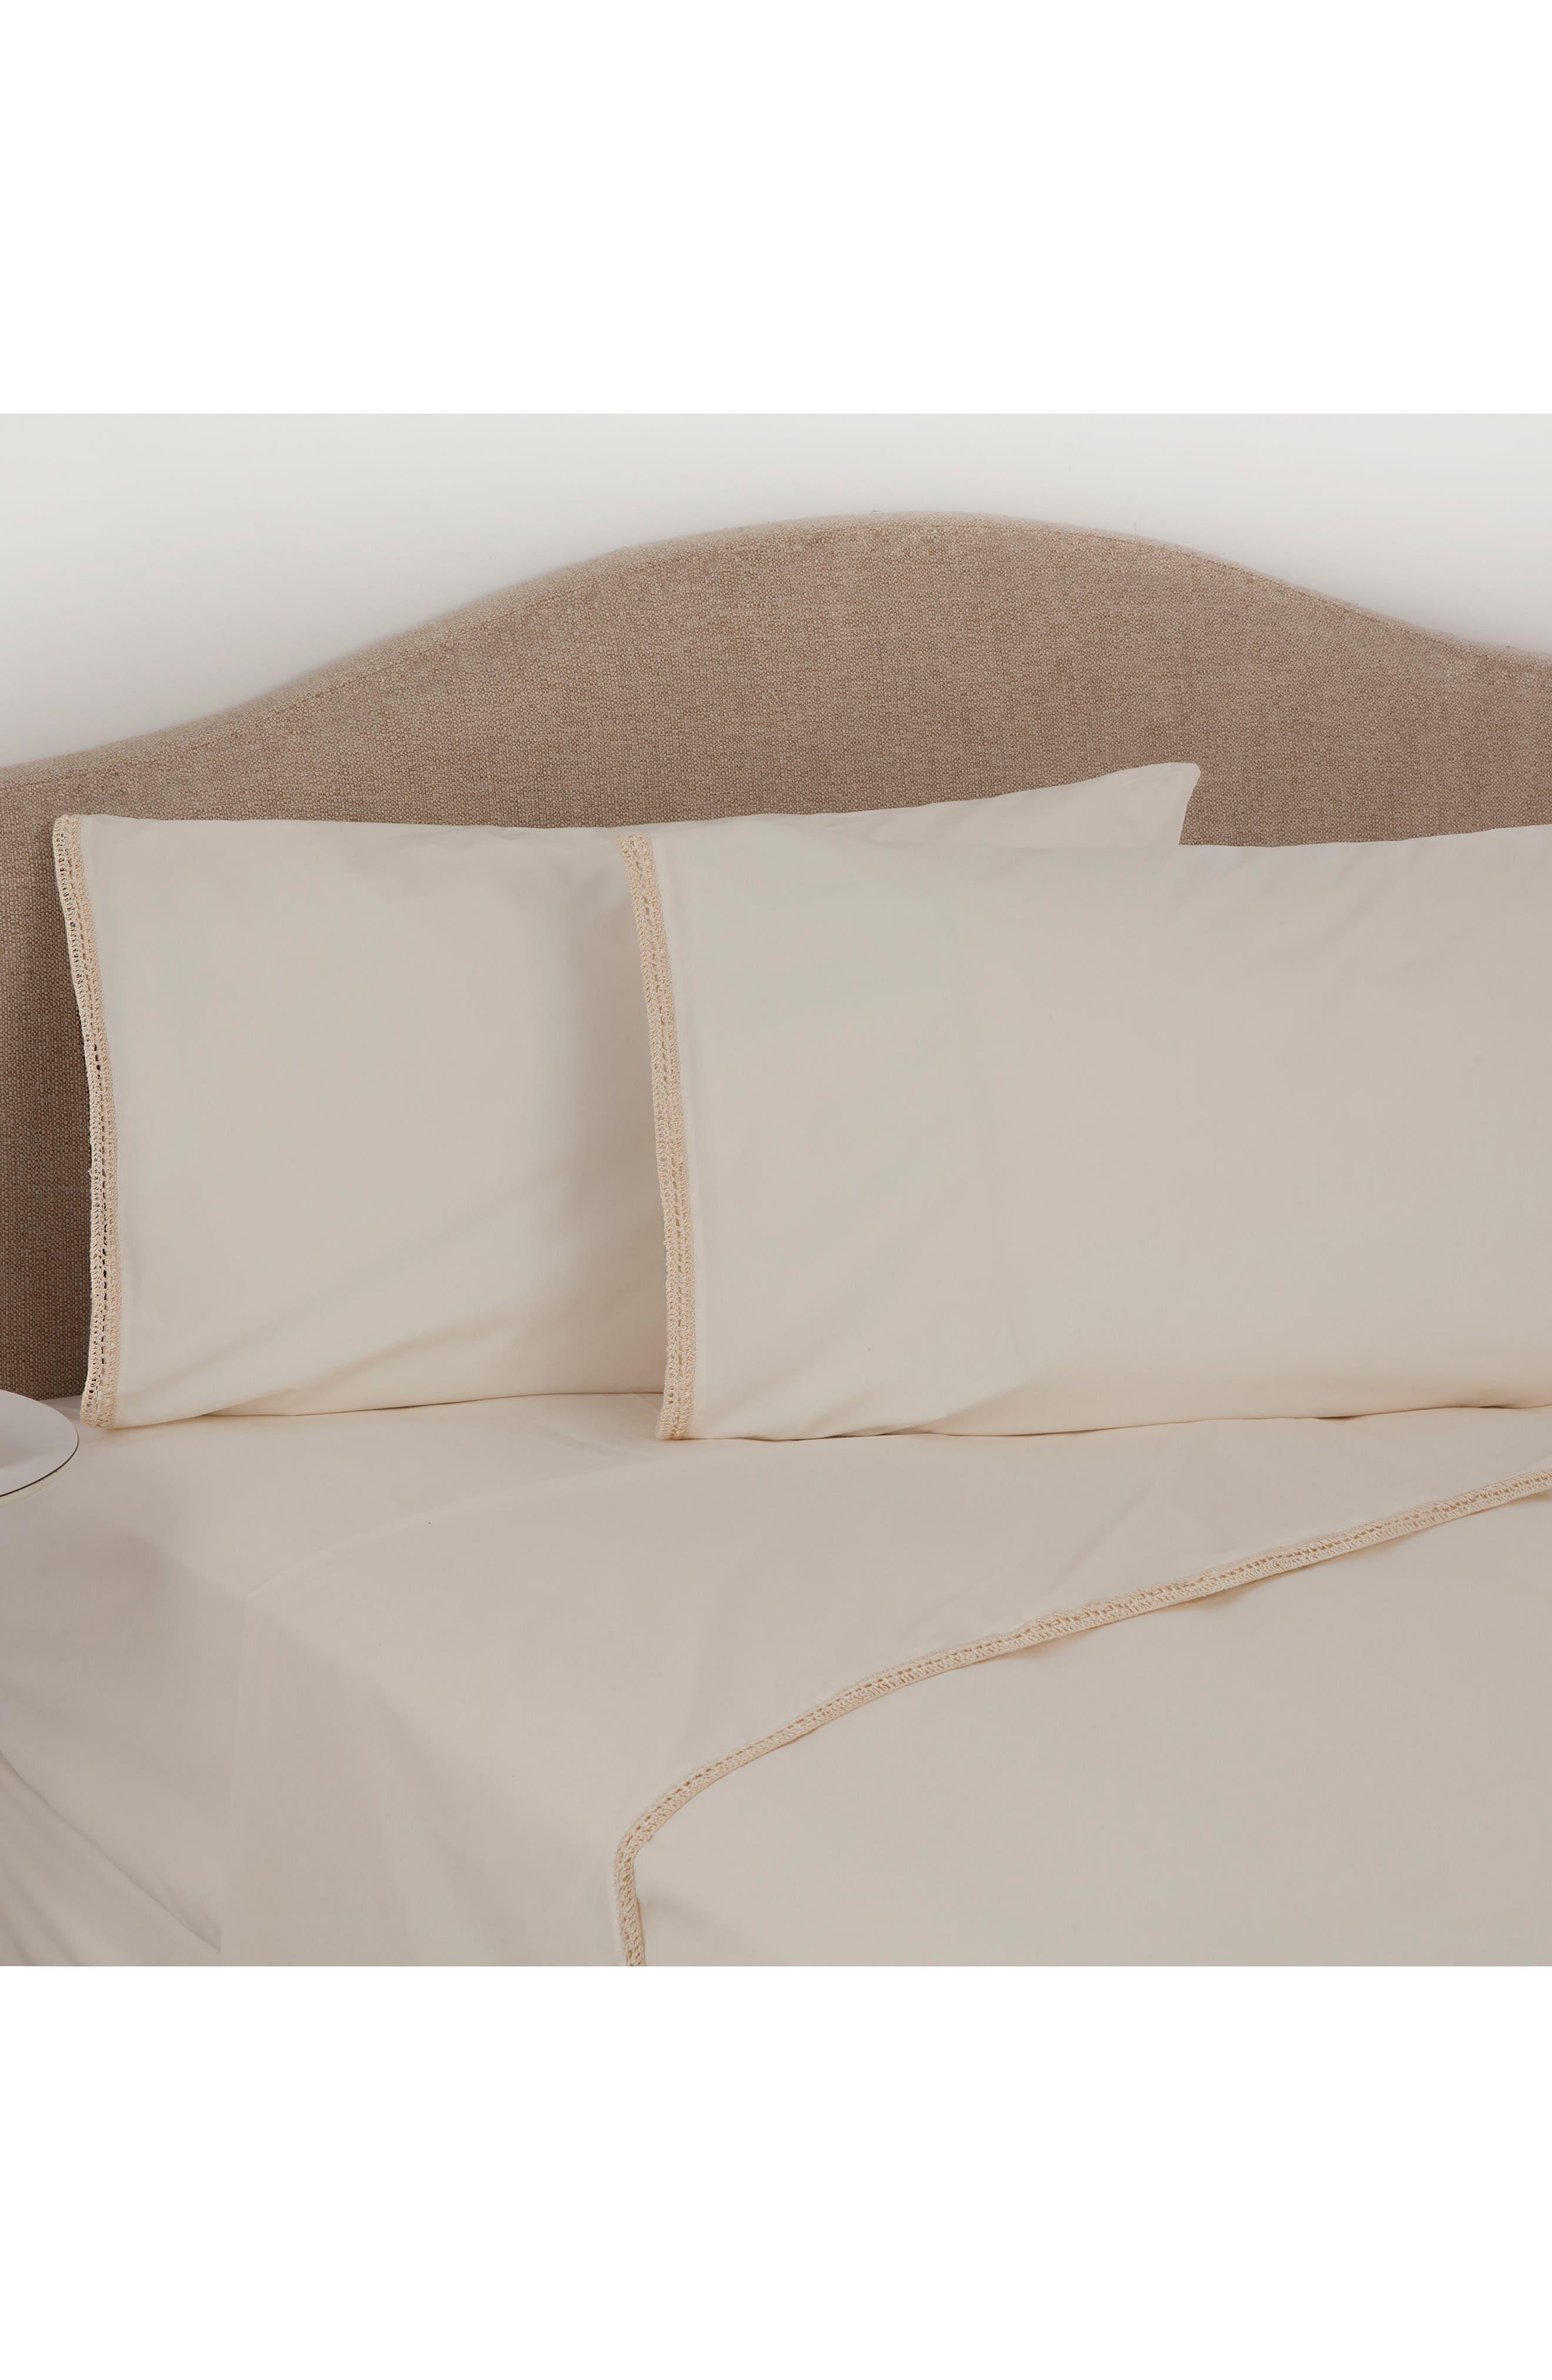 Alternate Image 1 Selected - Portico Crochet Trim Organic Cotton Flat Sheet